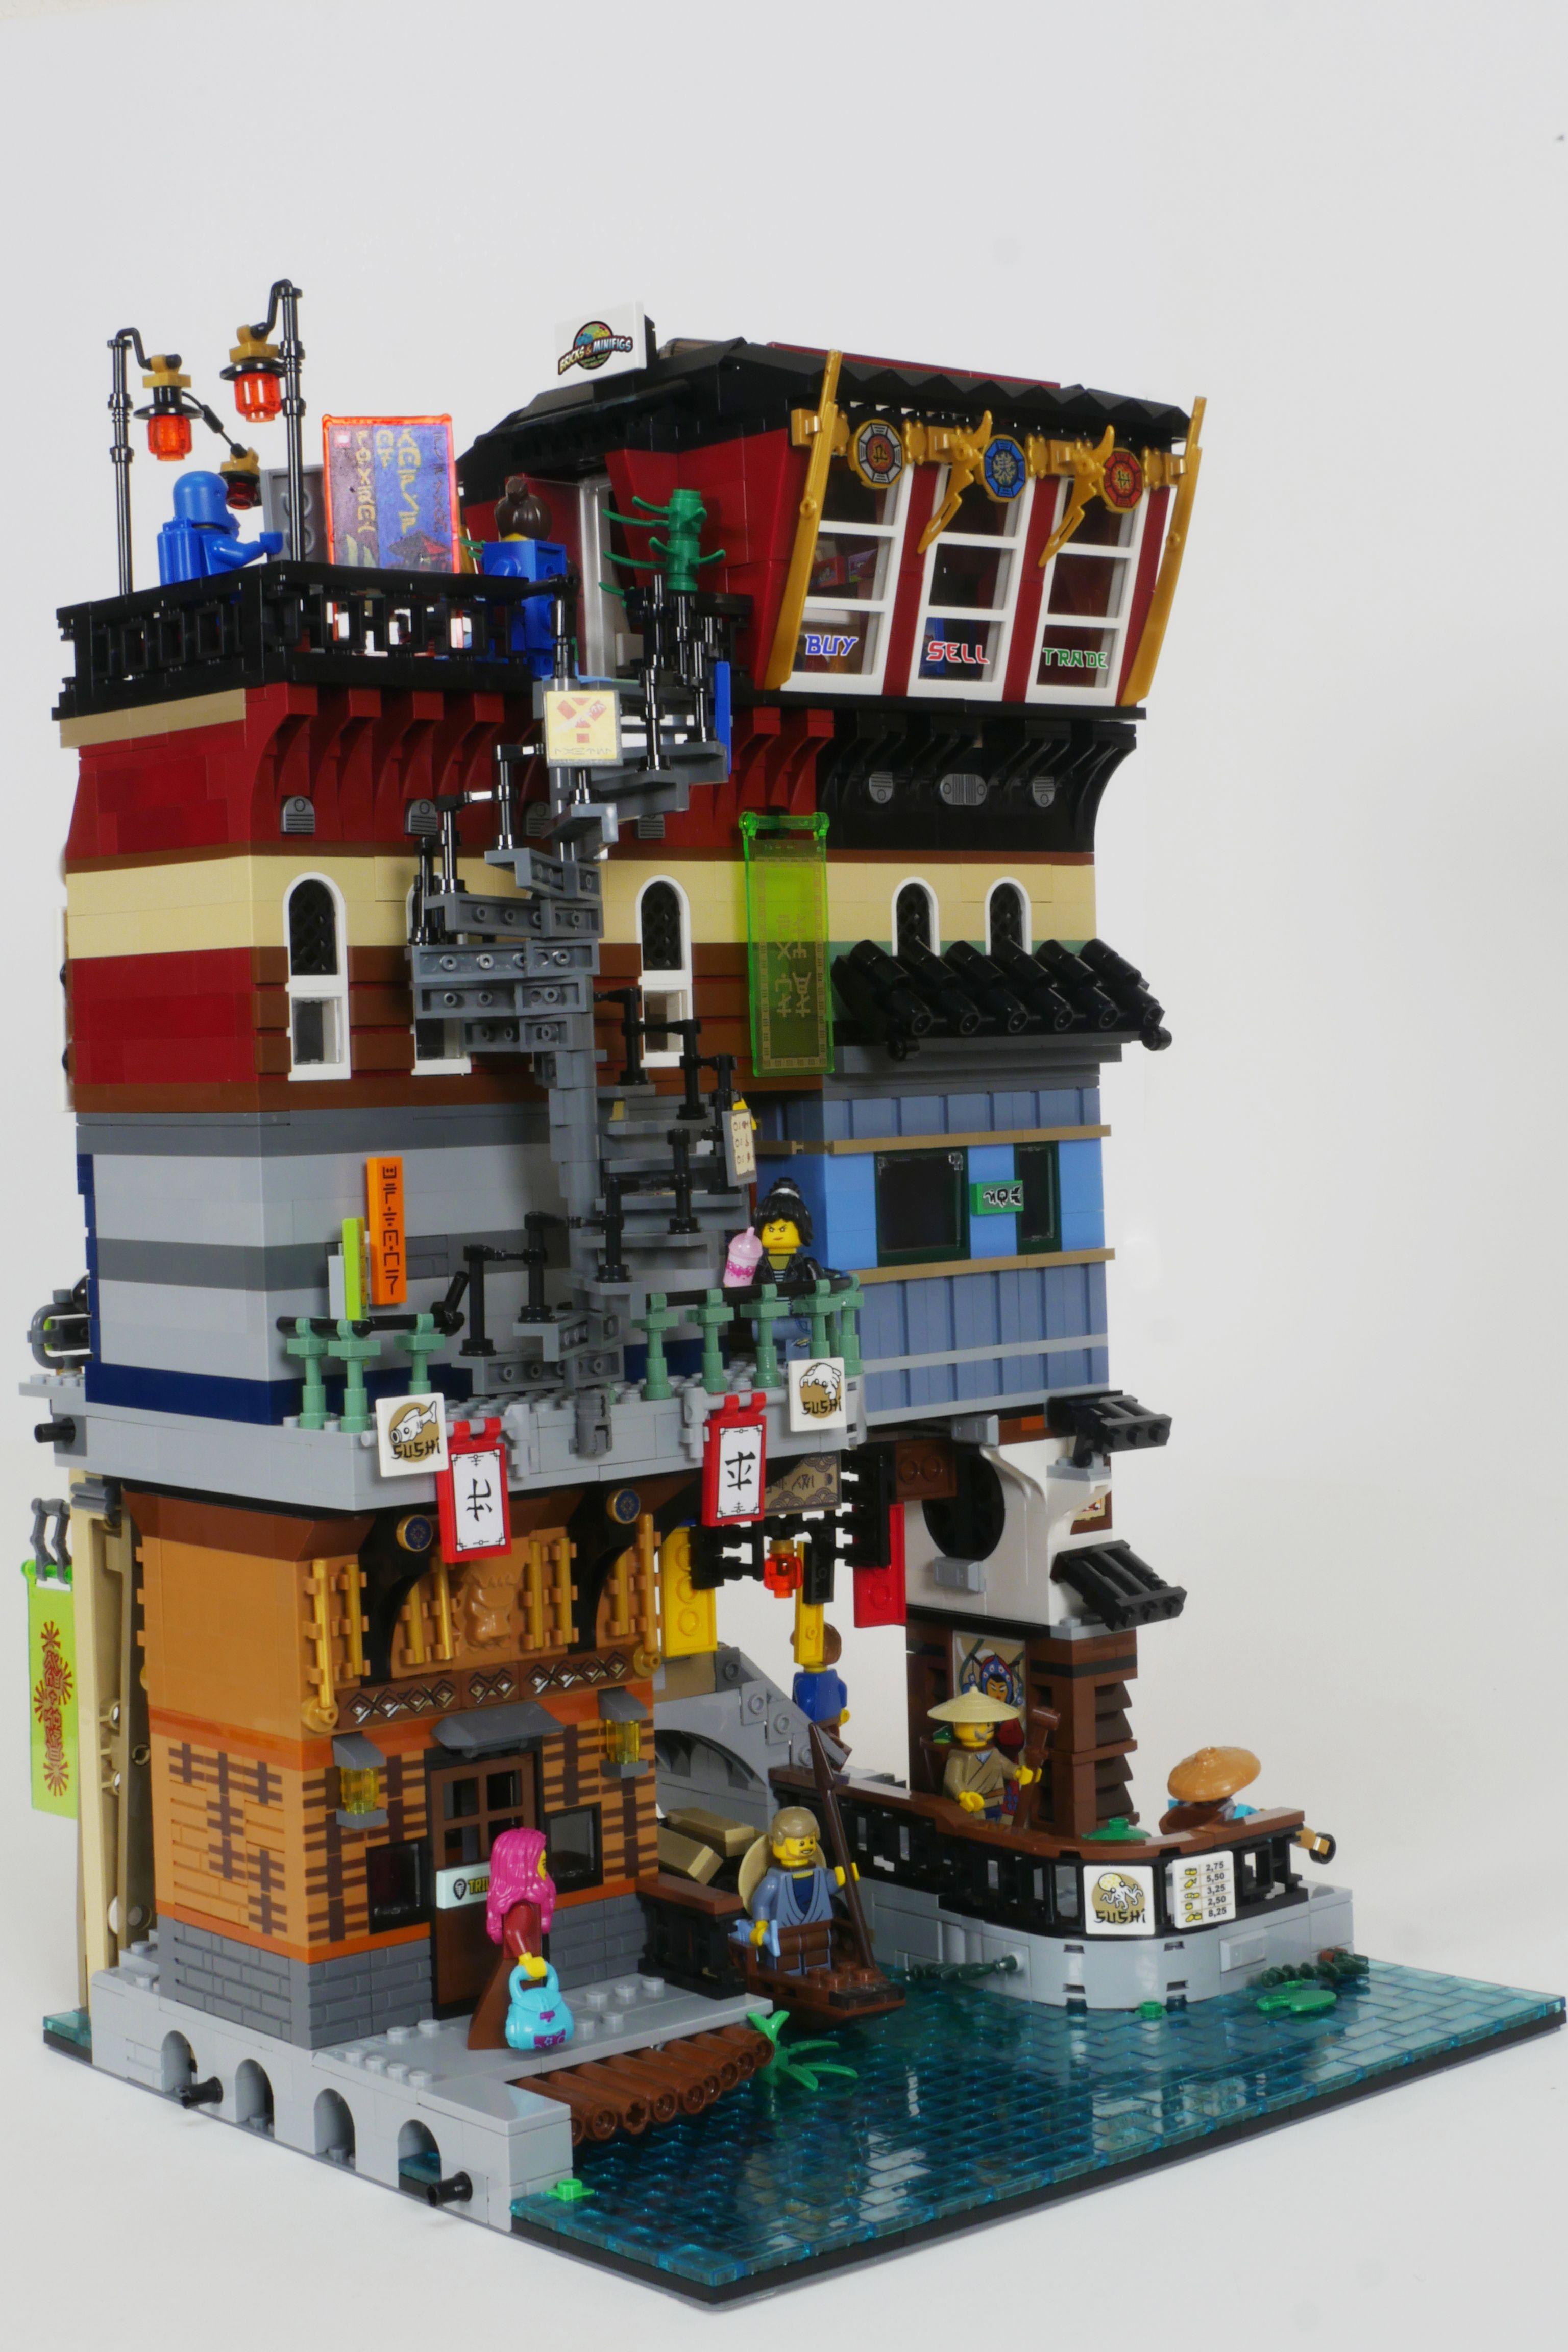 Pin By Rebecca Shields On Lego Lego Ninjago City Lego Design Lego Architecture